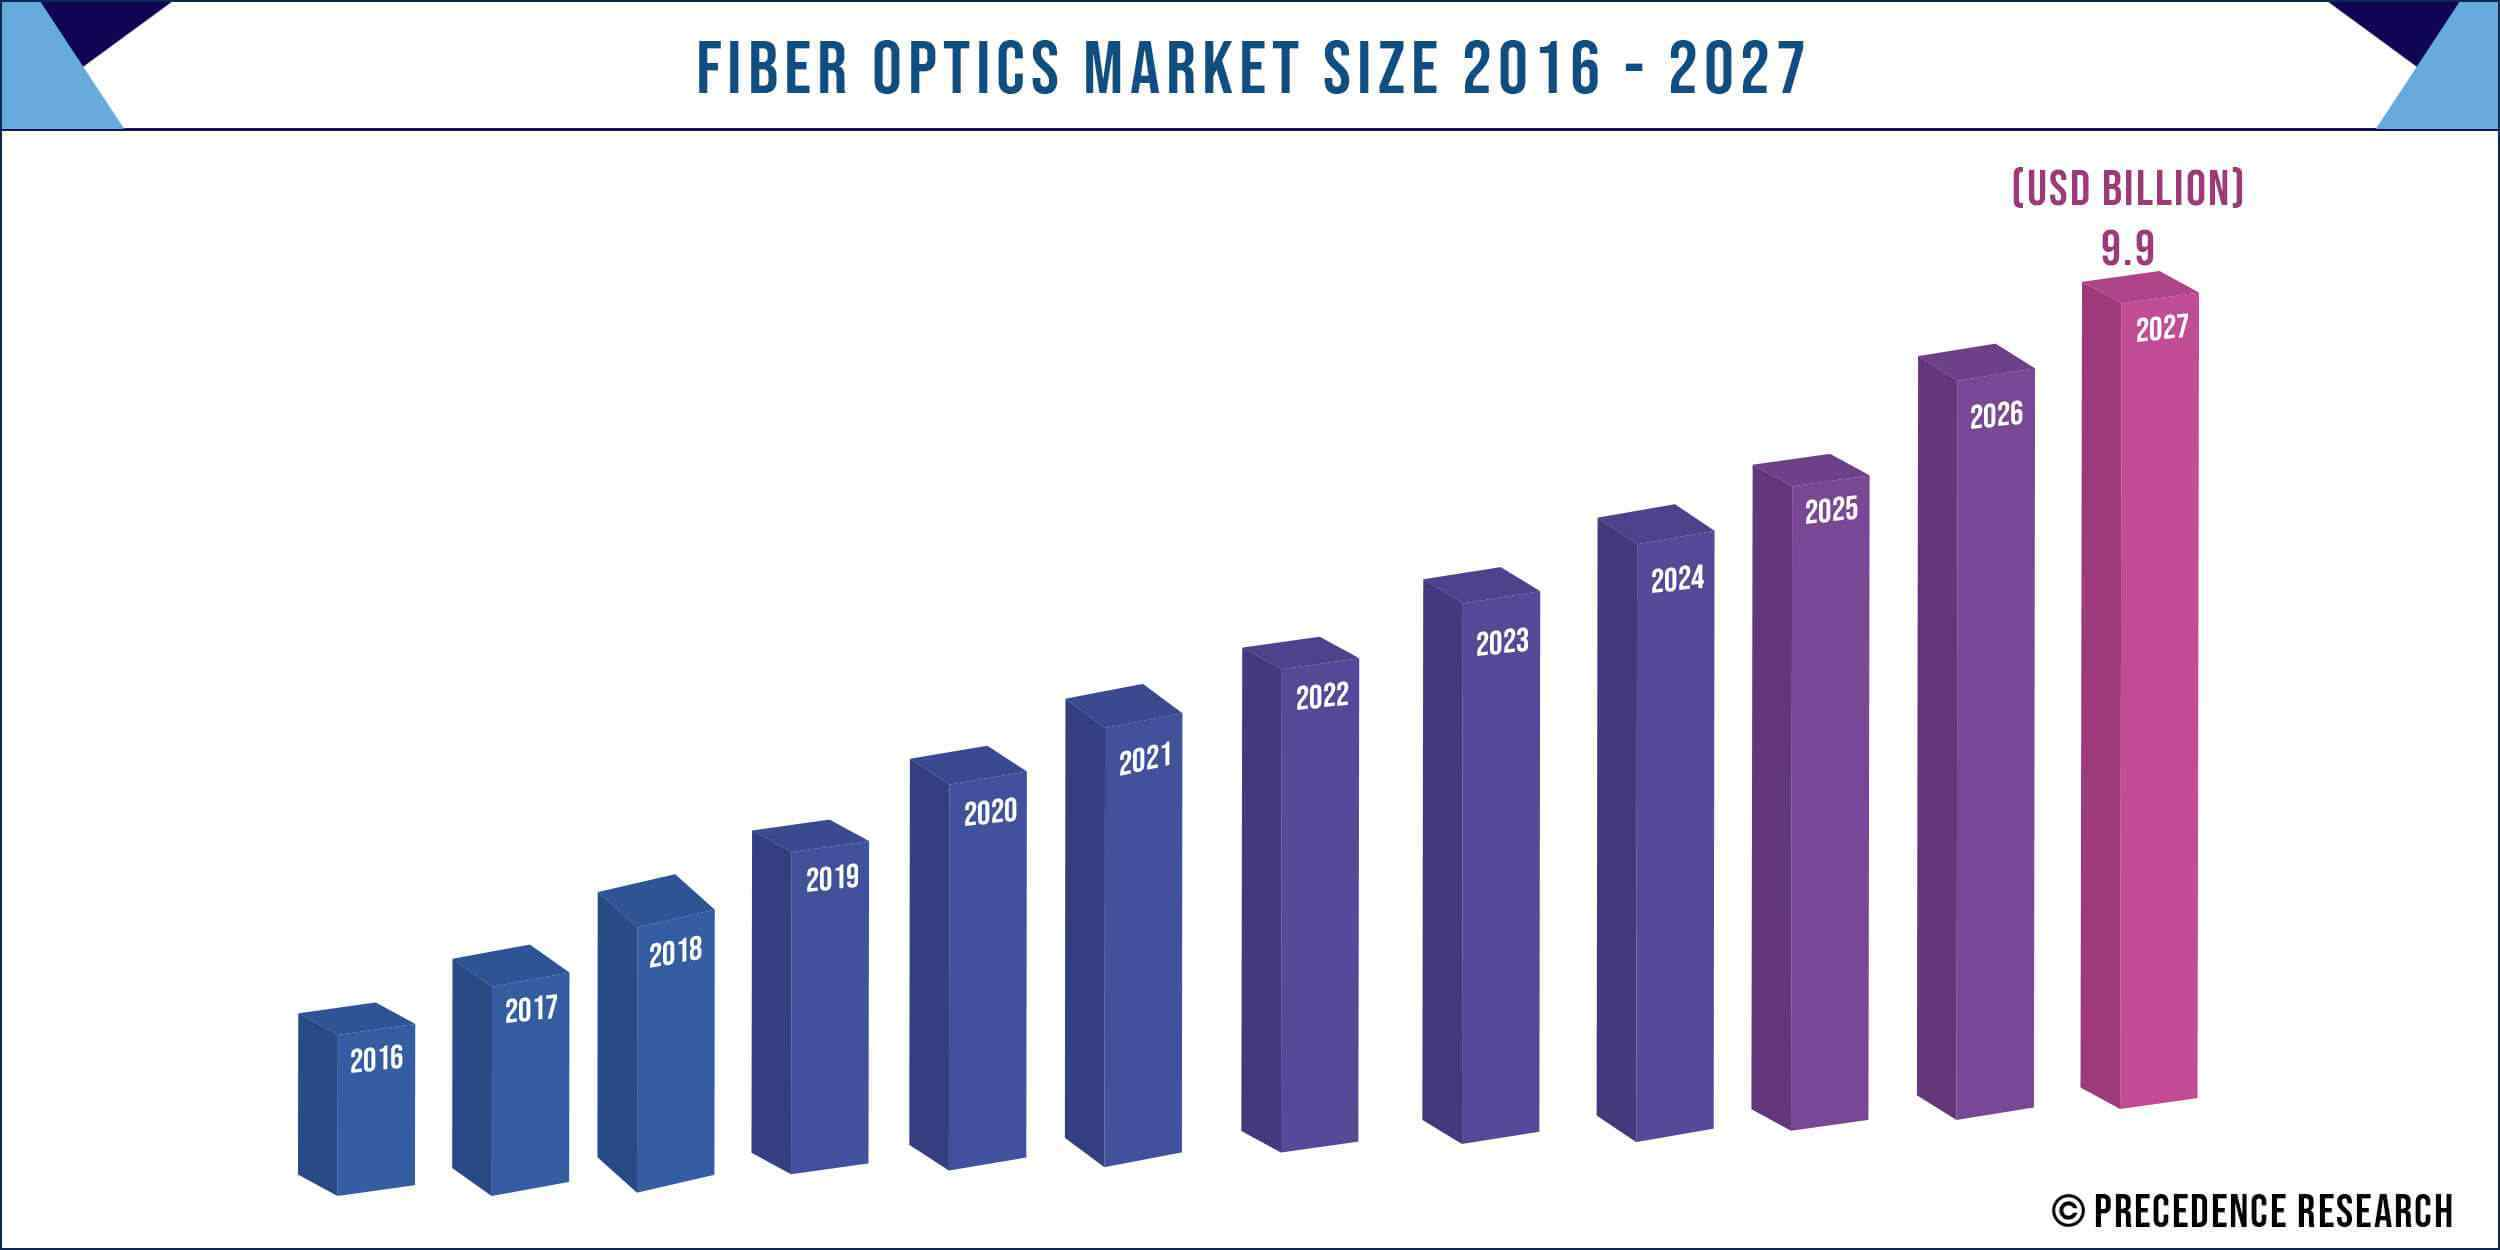 Fiber Optics Market Size 2016-2027